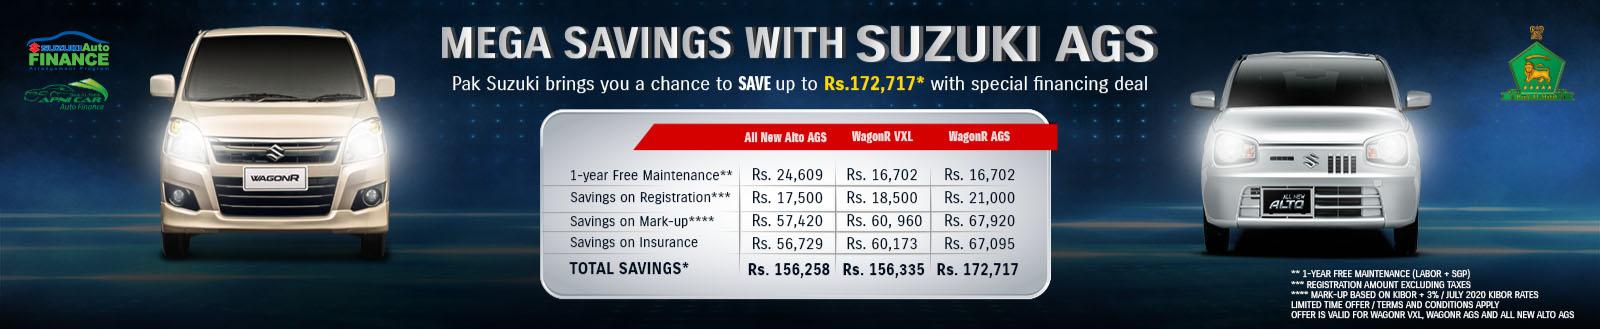 Pak Suzuki Offering 1 Year Free Maintenance on Selected Models 1